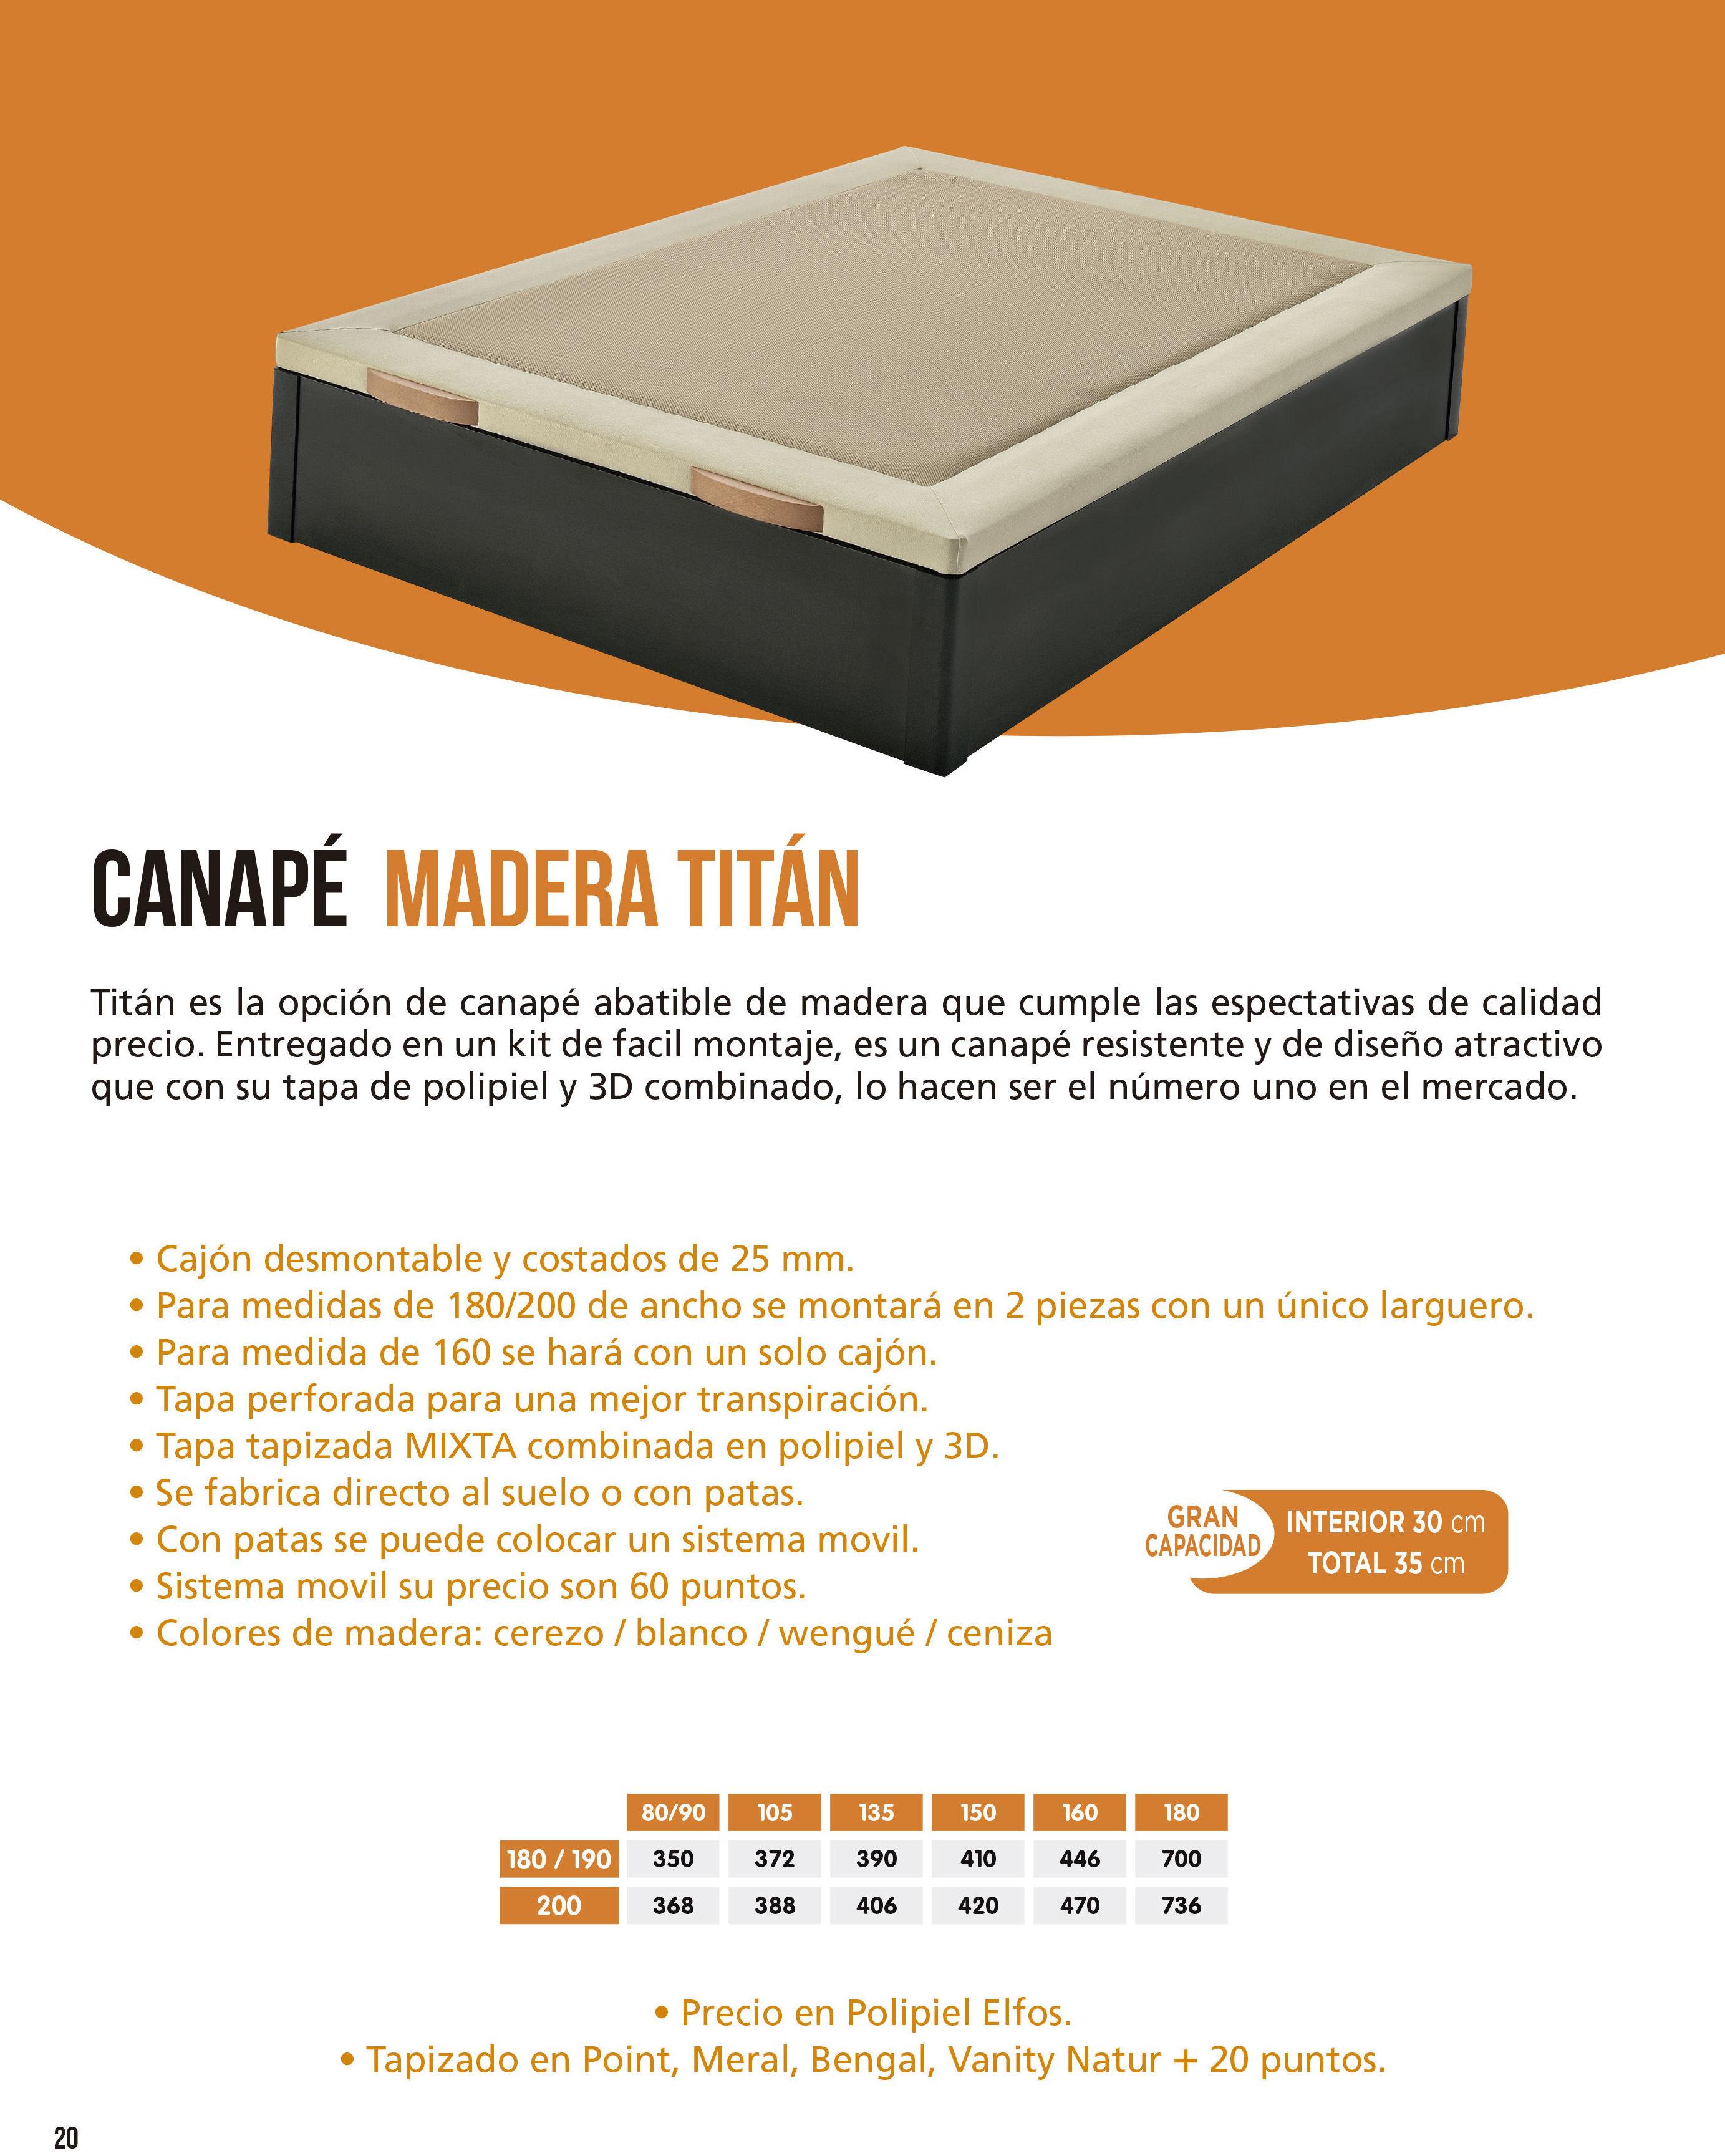 Canapé Madera Titán